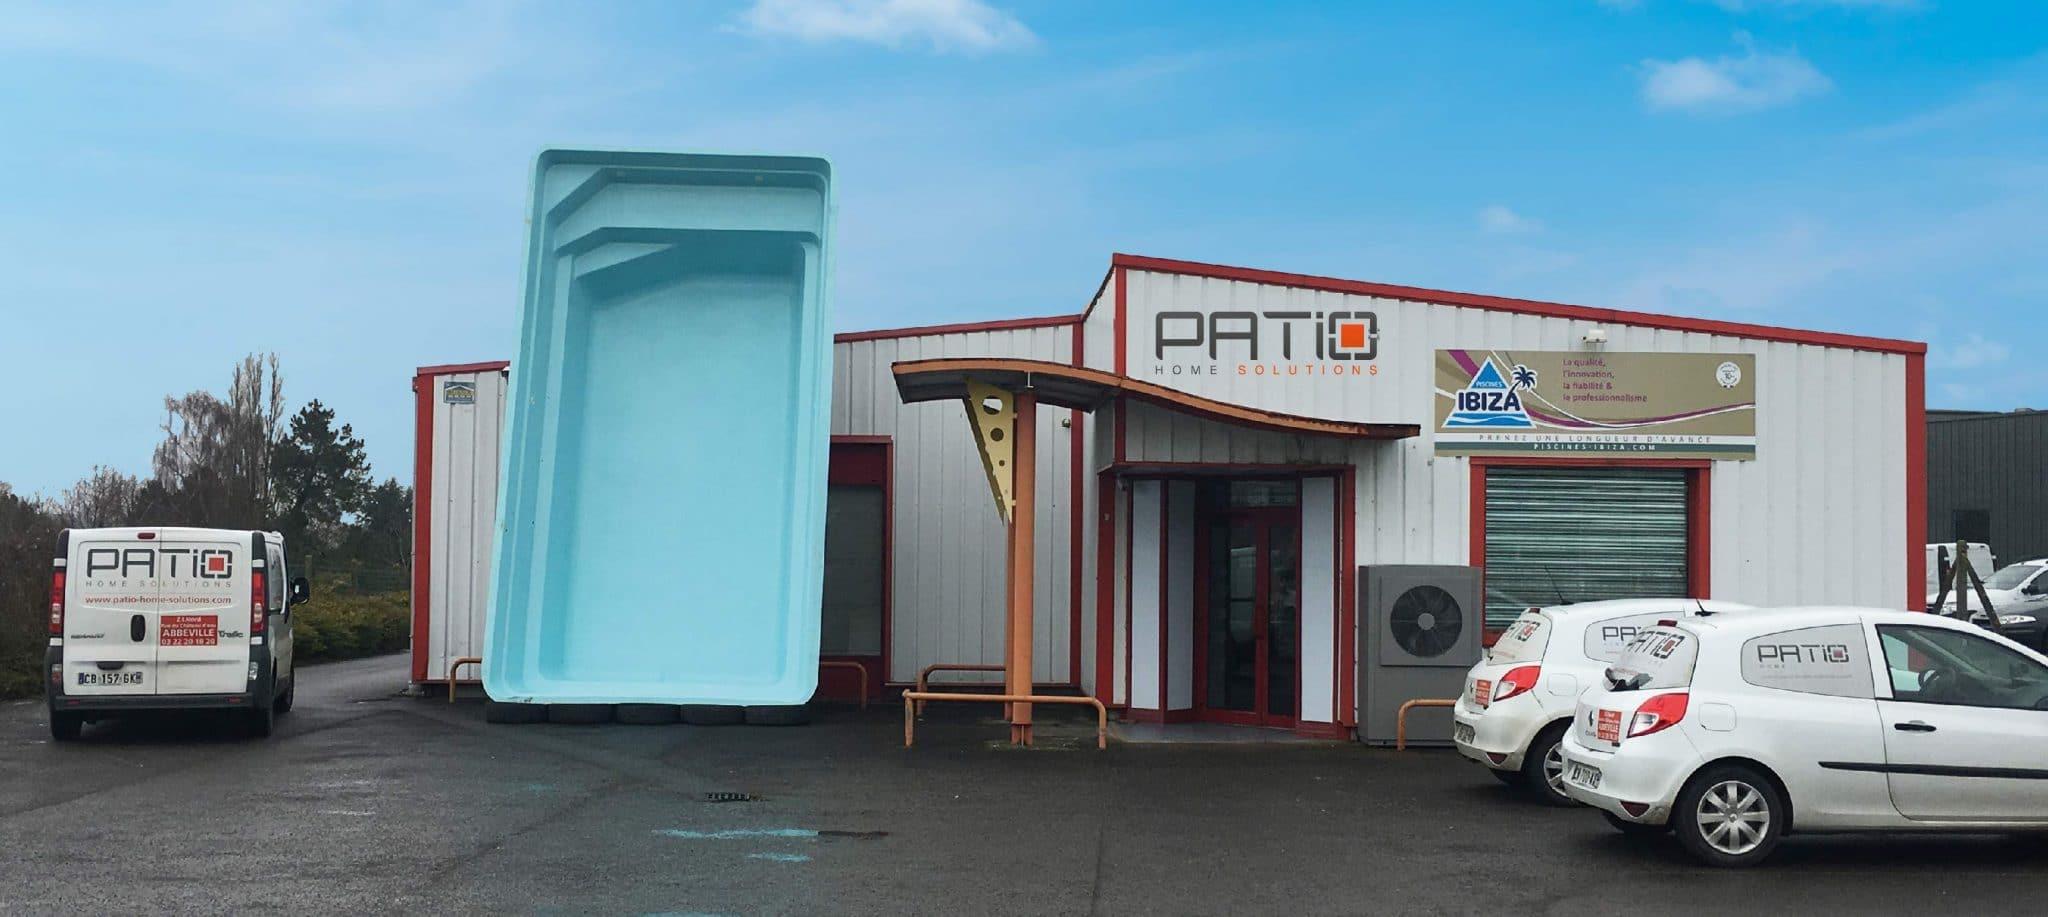 Pisciniste Boulogne Sur Mer, Calais, Abbeville - Piscines Ibiza serapportantà Piscine Abbeville